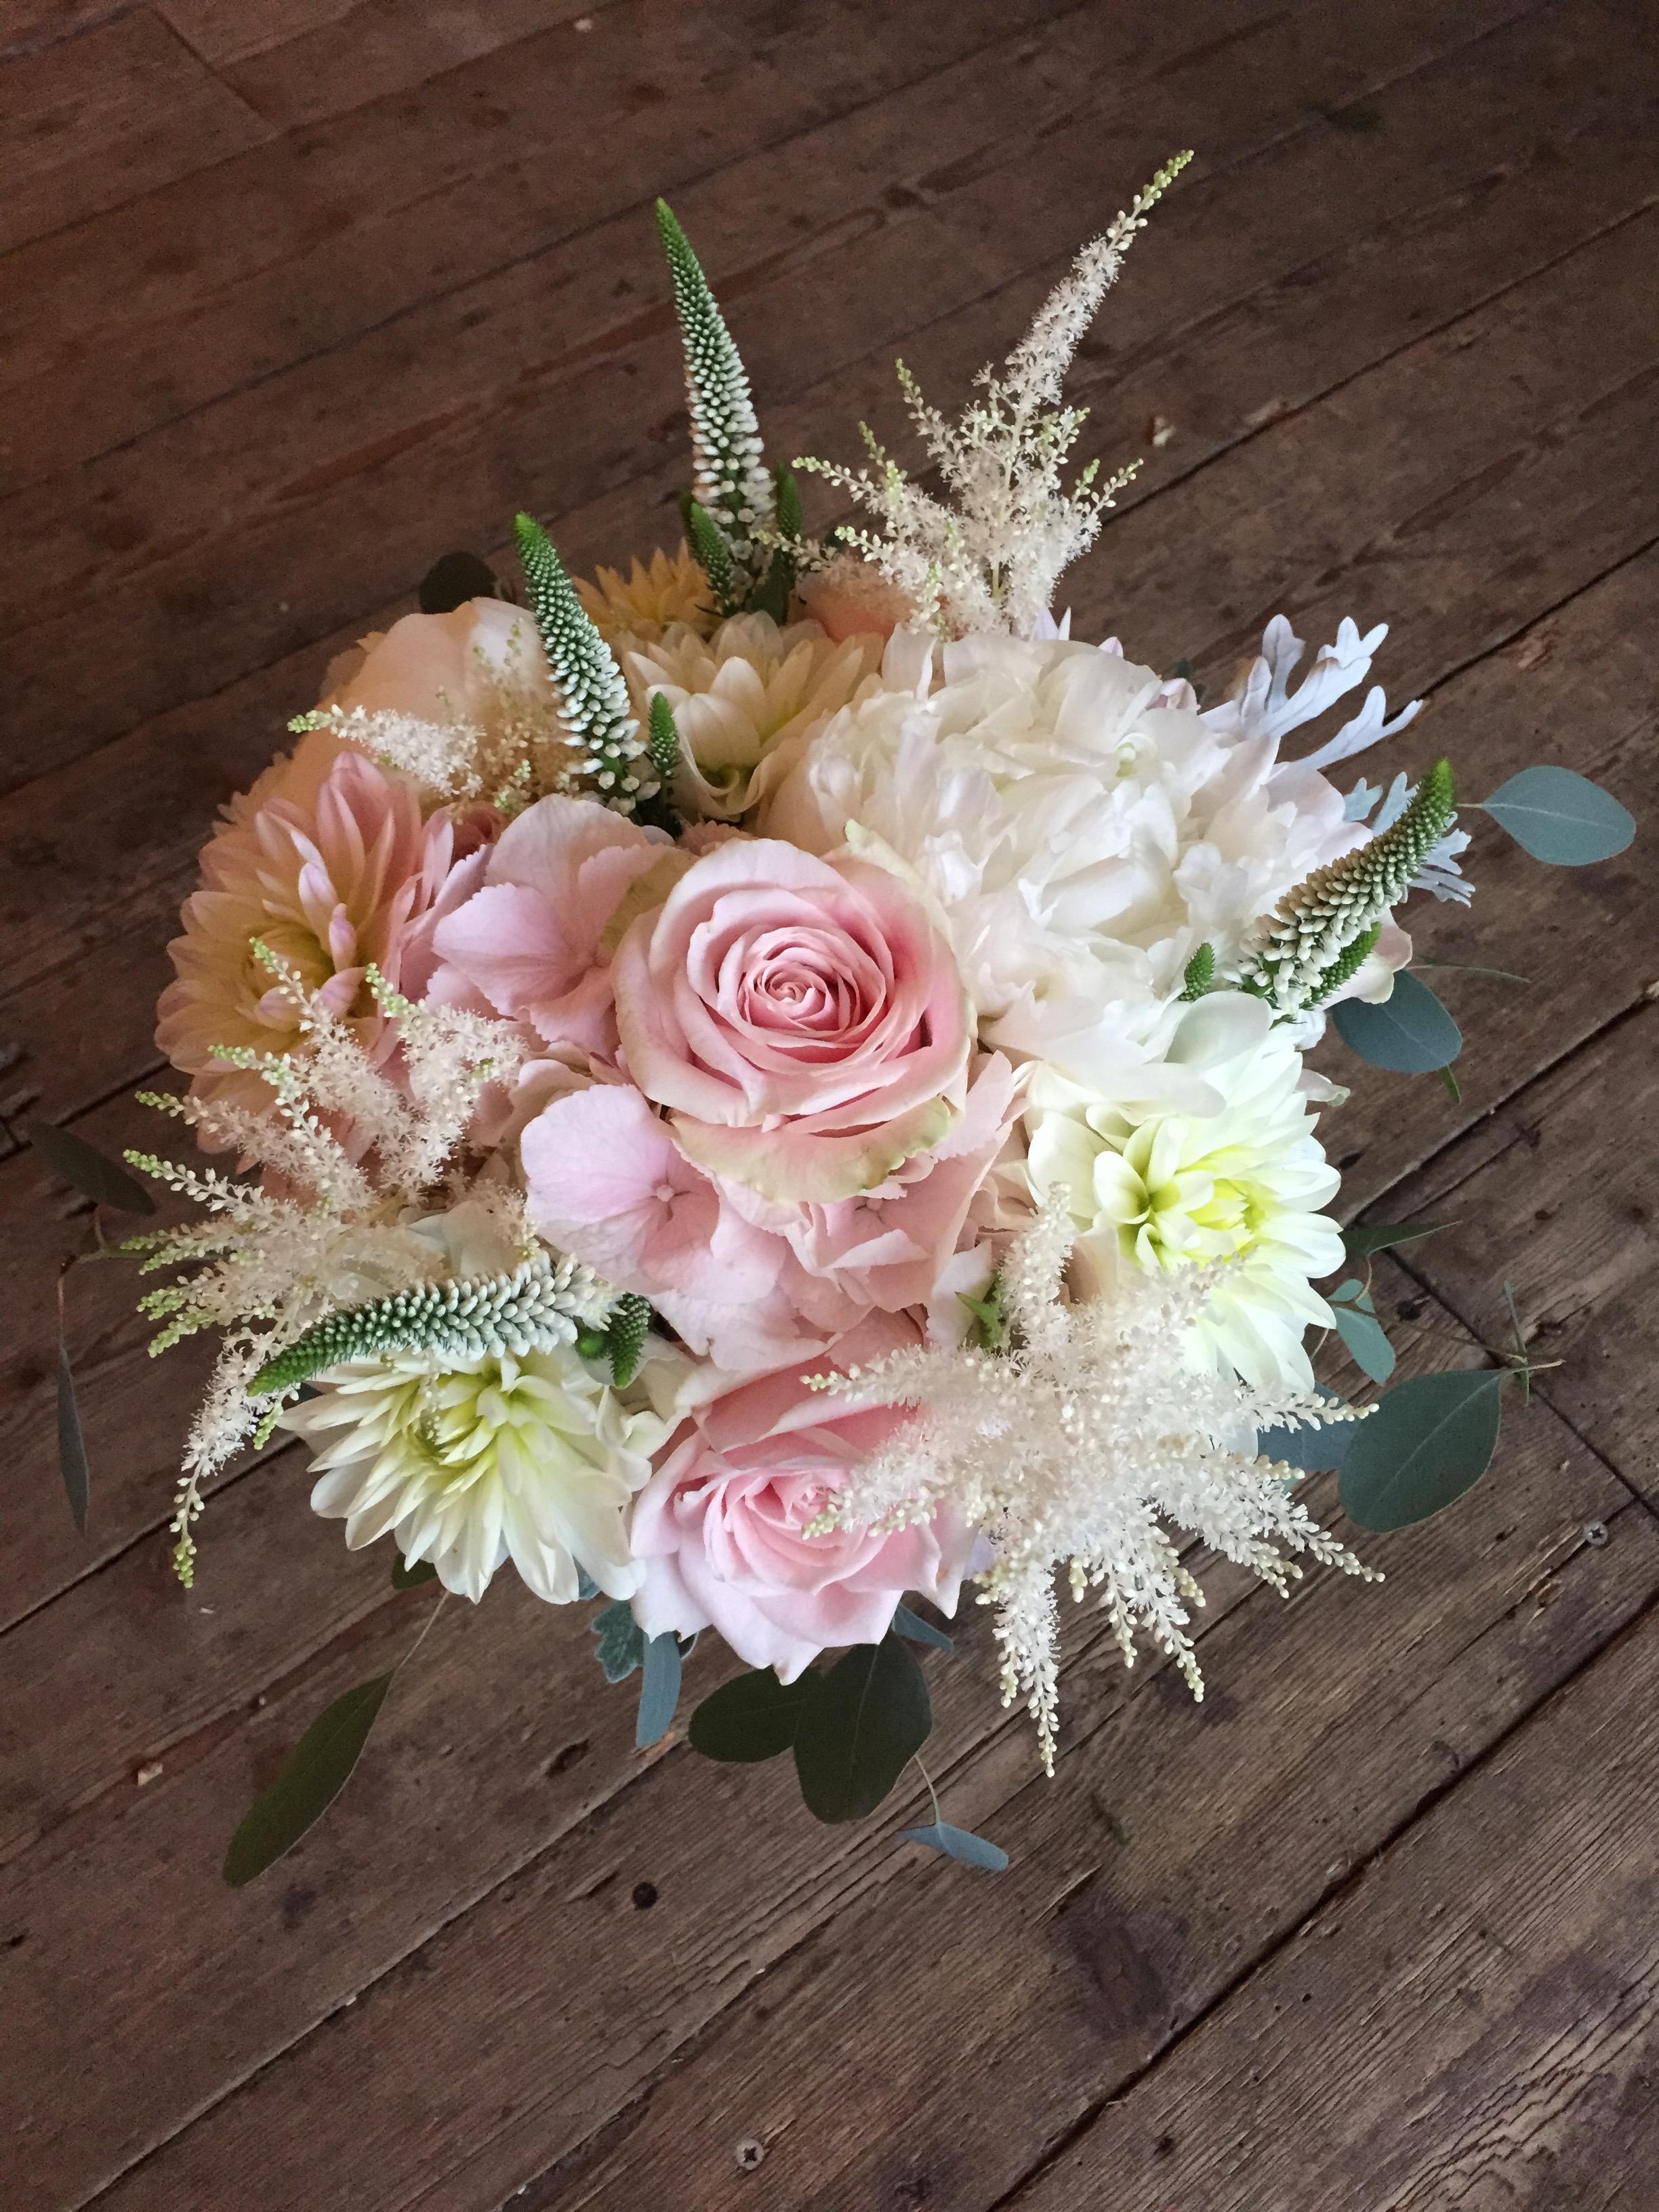 Buying Wedding Flowers